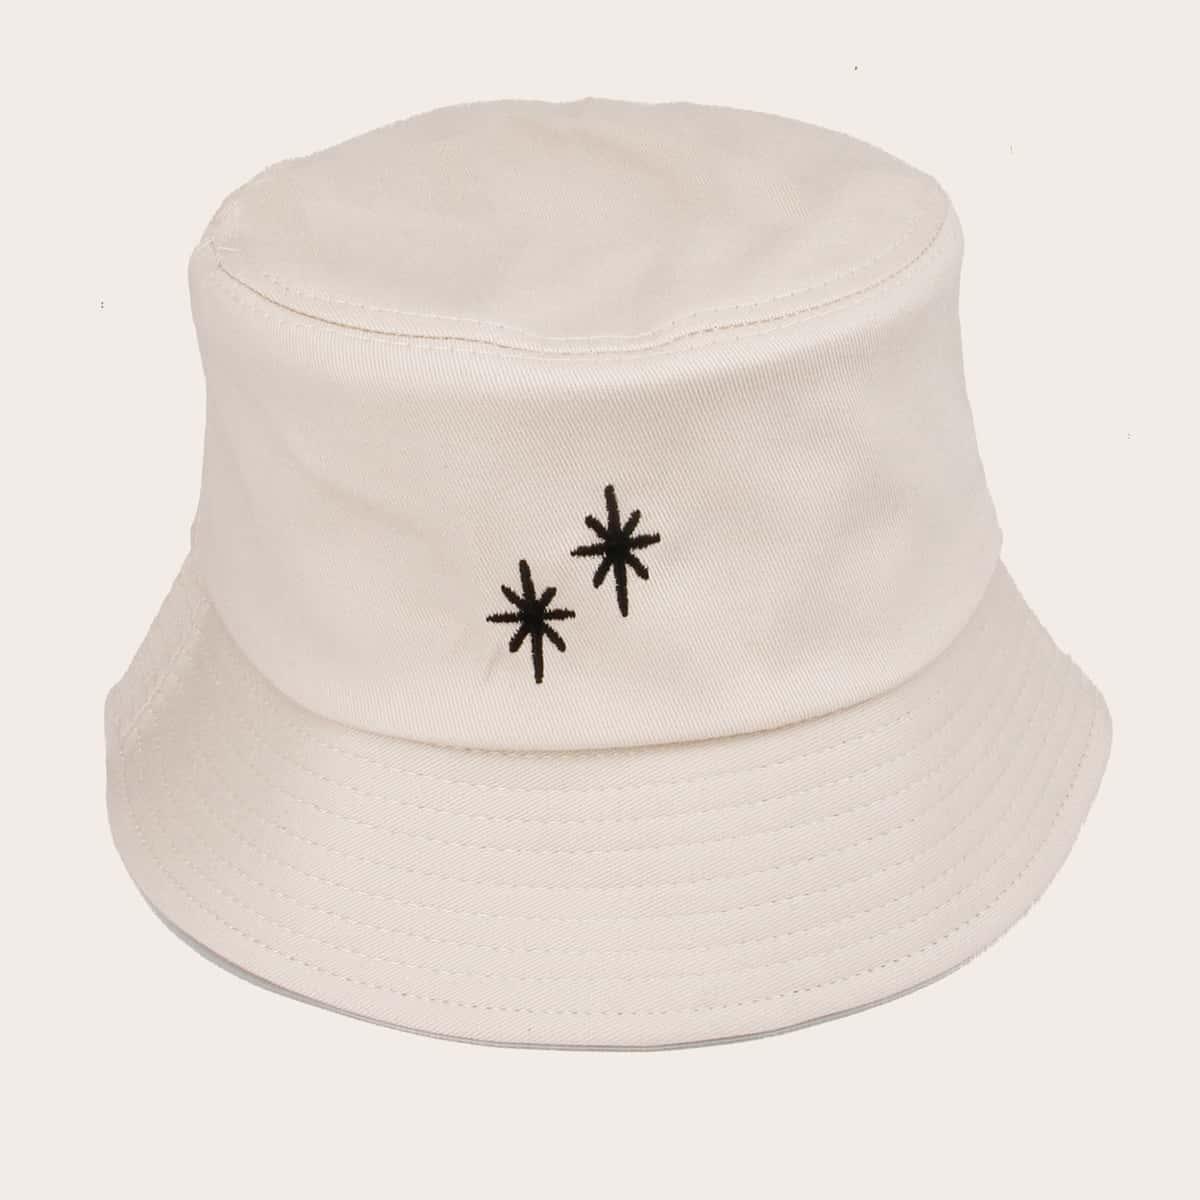 Мужская шляпа с вышивкой звезды фото